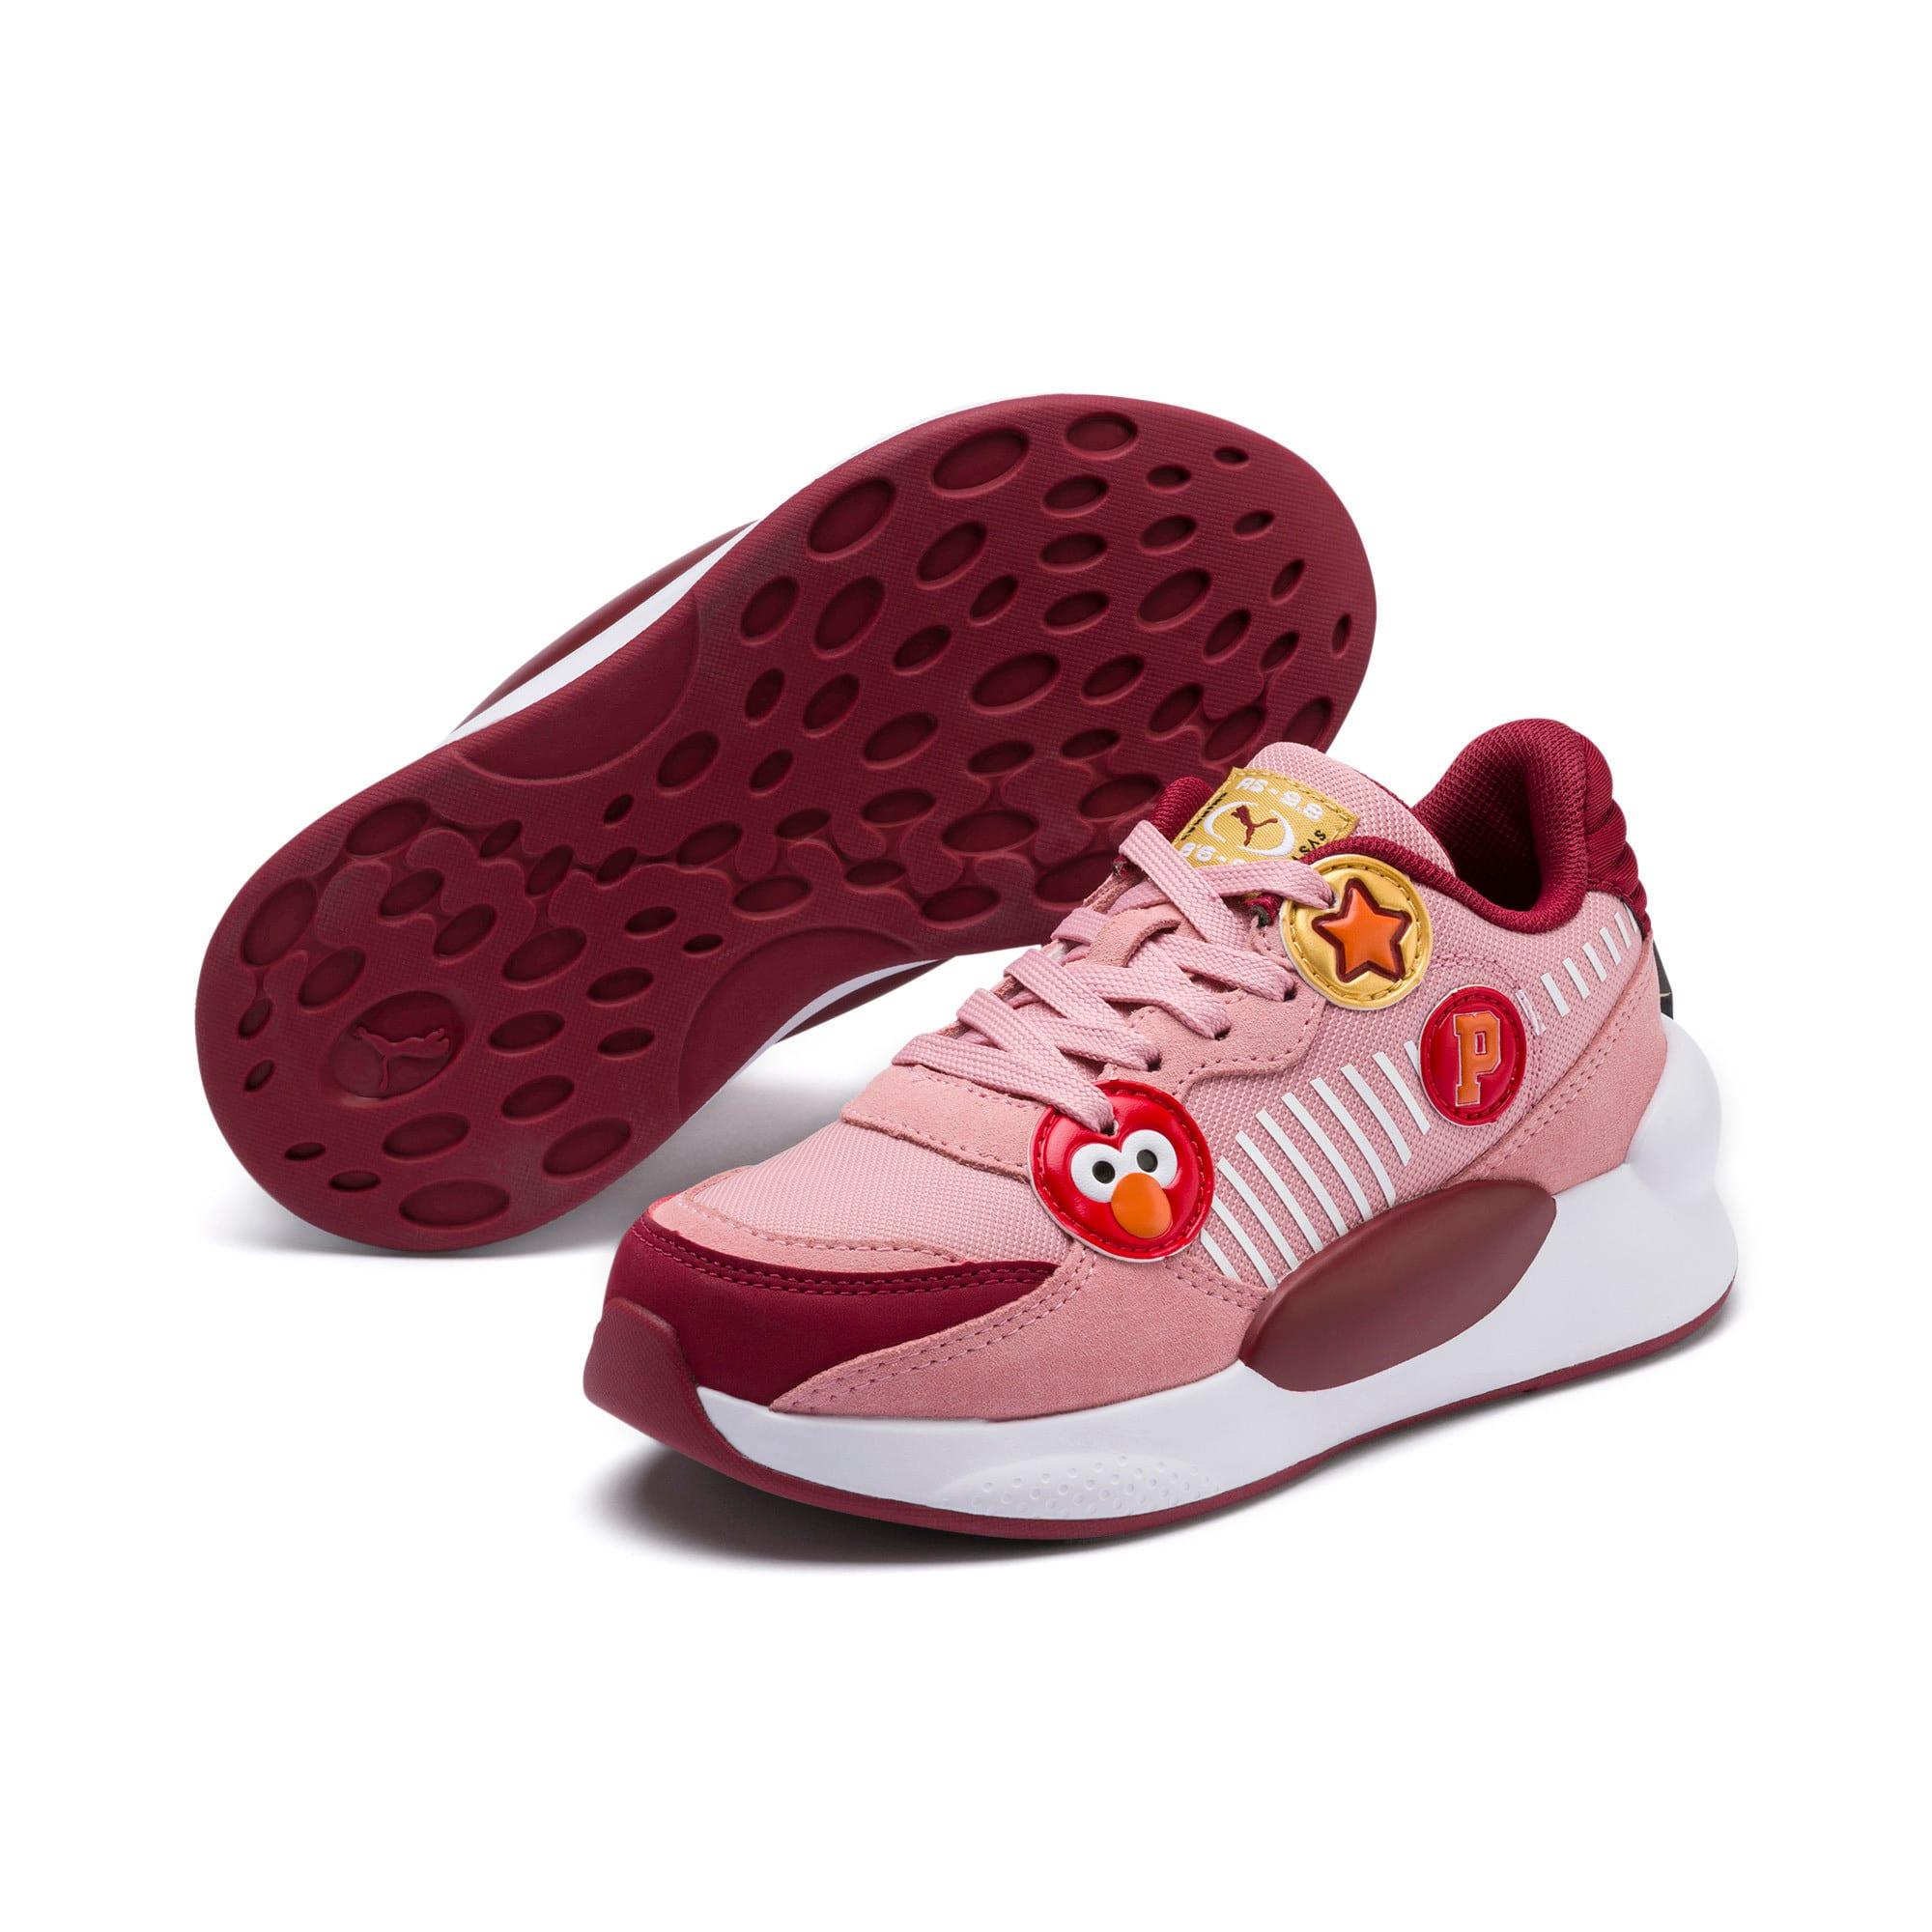 Thumbnail 2 of PUMA x SESAME STREET 50 RS 9.8 Little Kids' Shoes, Bridal Rose-Rhubarb, medium